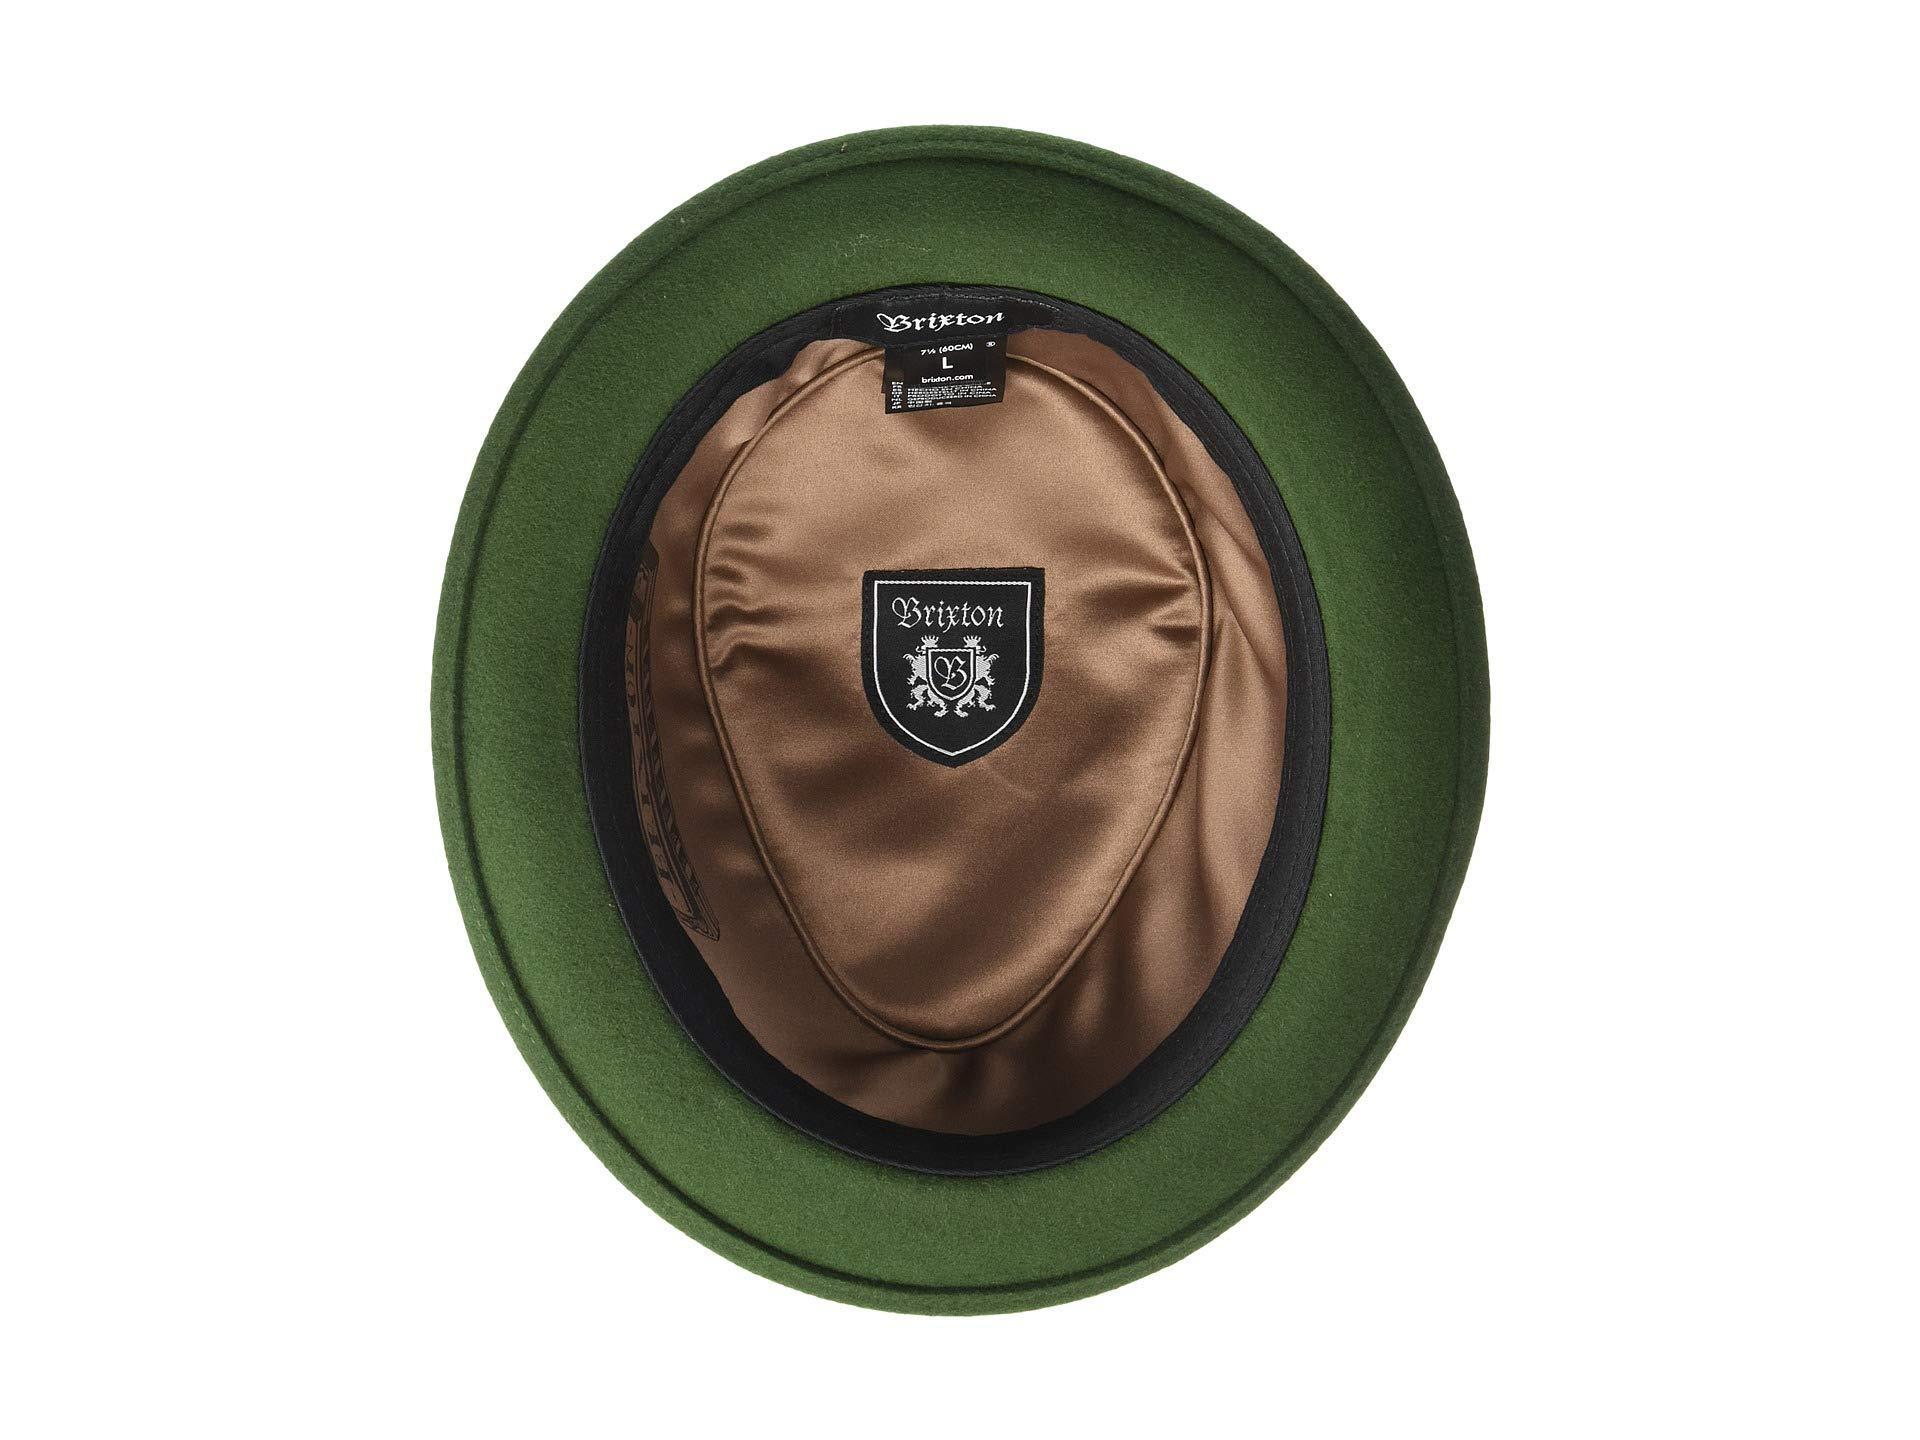 Brixton - Green Stout Pork Pie Hat (moss bronze) Traditional Hats for Men.  View fullscreen 6e7f9ca2debd